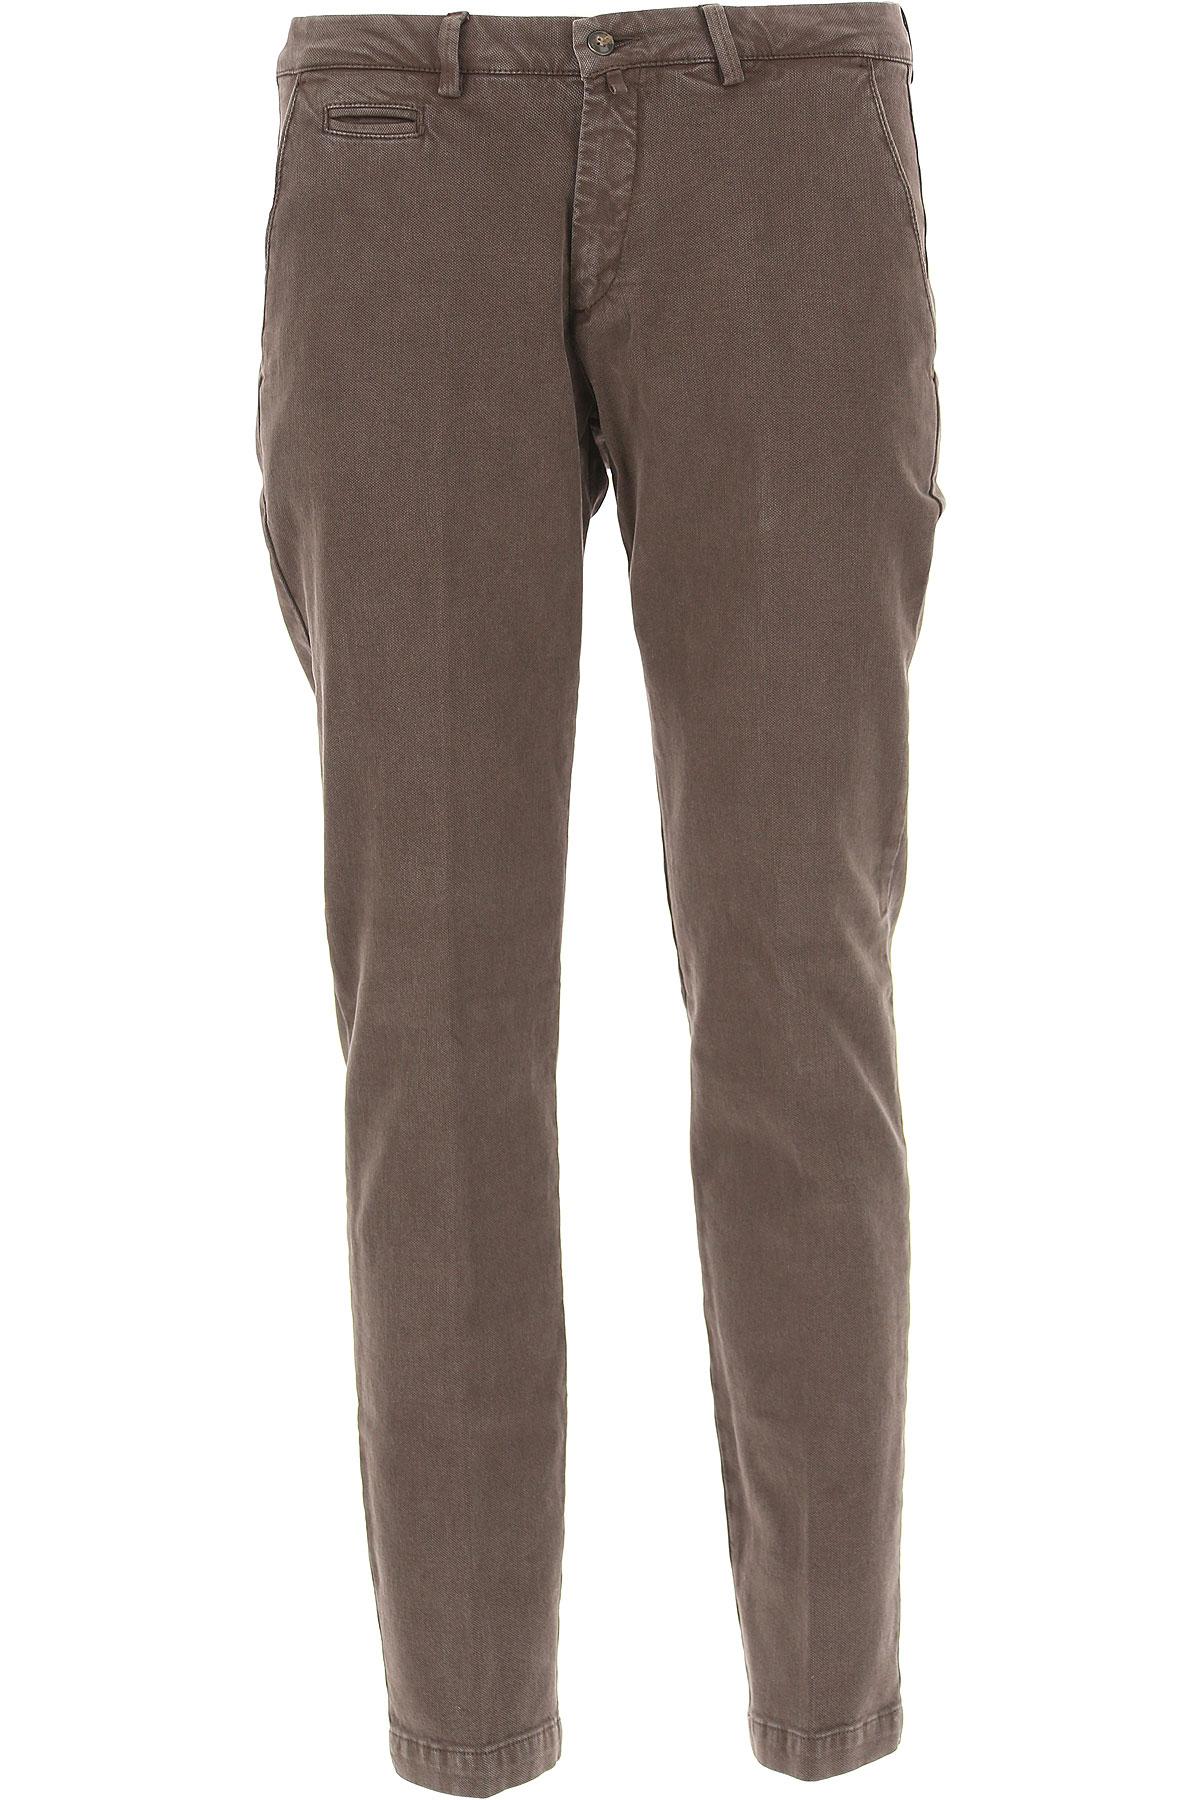 Image of Briglia Pants for Men, Brownish-grey, Cotton, 2017, US 34 - EU 48 US 36 - EU 50